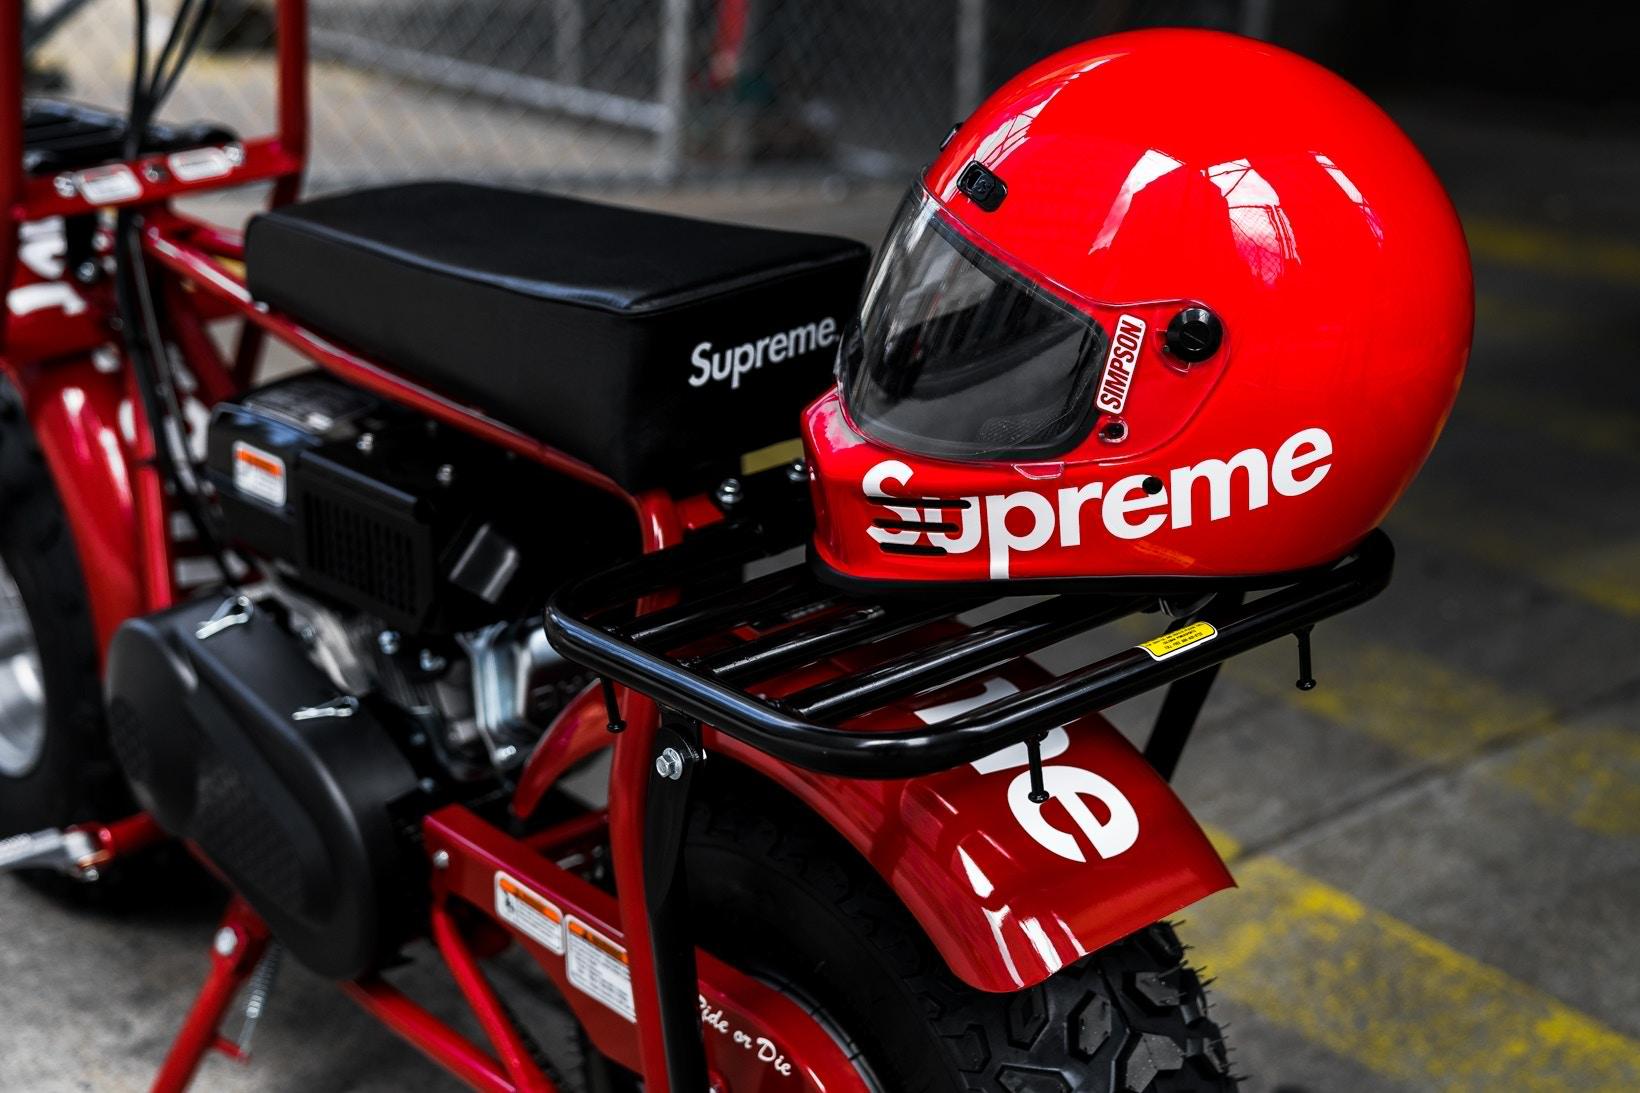 supreme coleman ct200u minibike 04 - Supreme lança oficialmente minimoto com a Coleman